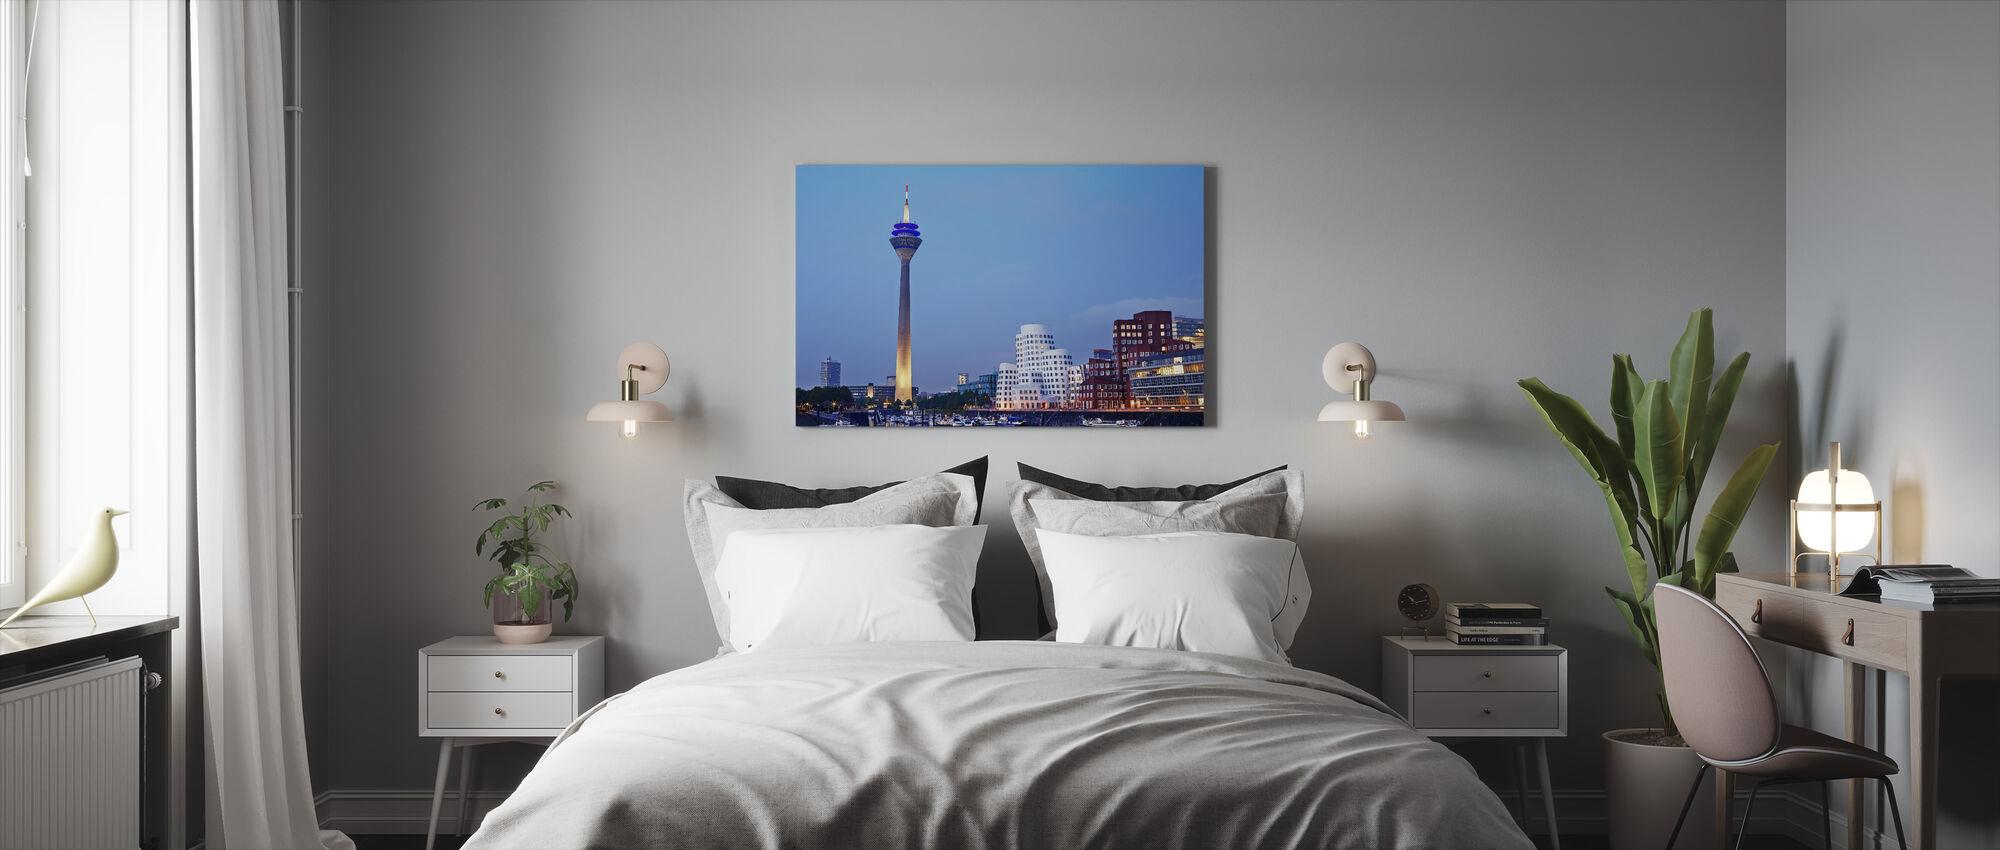 Düsseldorf's Rheinturm Tower at Dusk - Canvas print - Bedroom